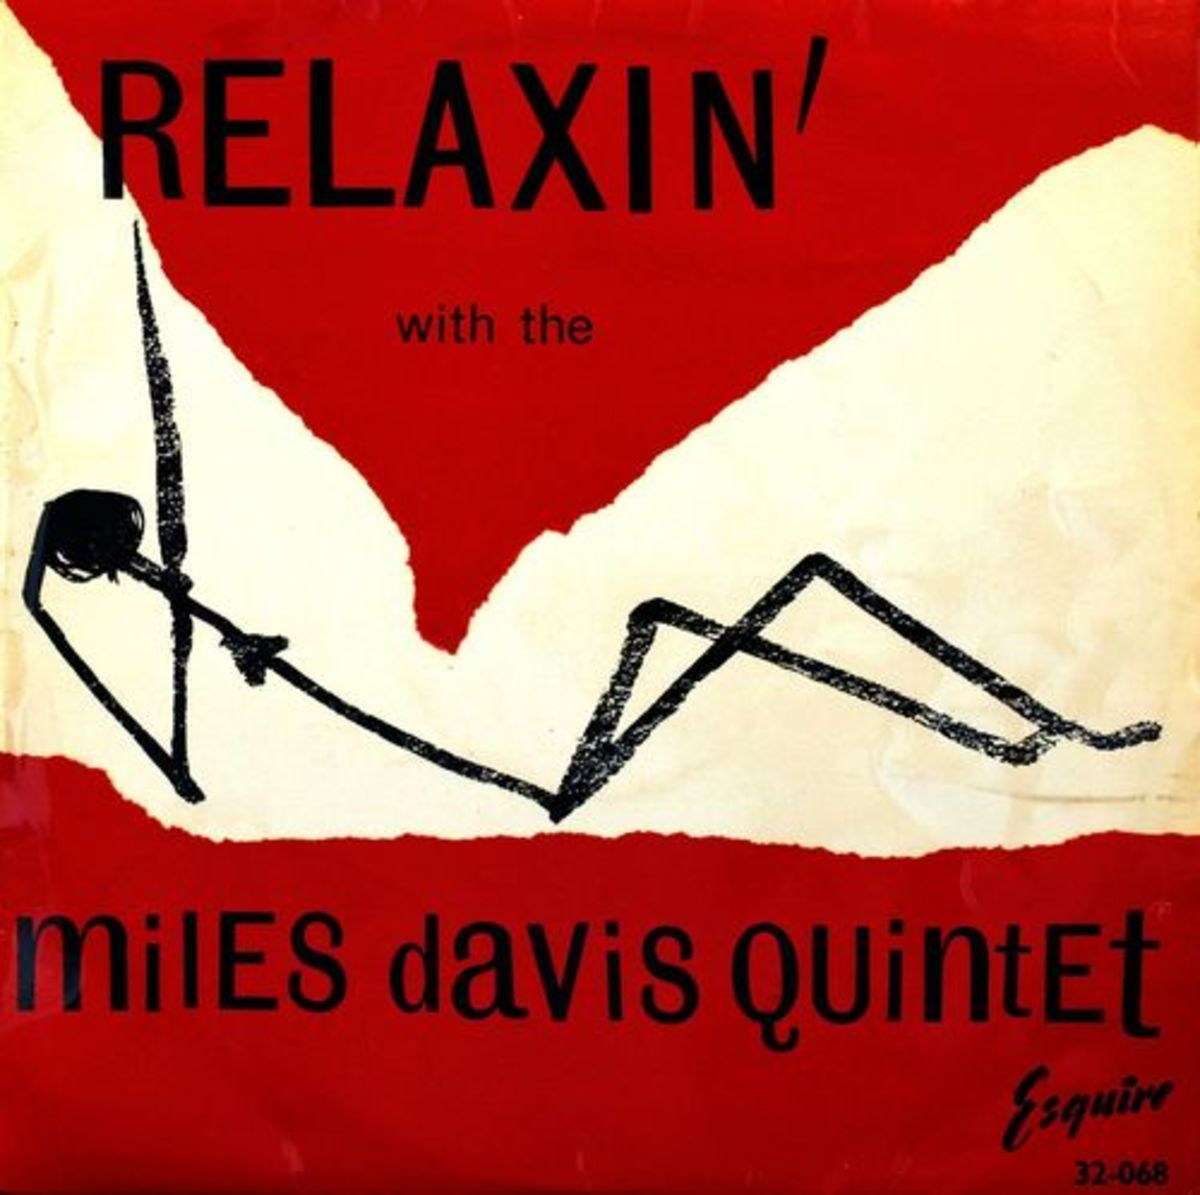 "Miles Davis ""Relaxin' with Miles Davis Quintet"" Esquire Records 32-068 12"" LP Vinyl Record 1956"